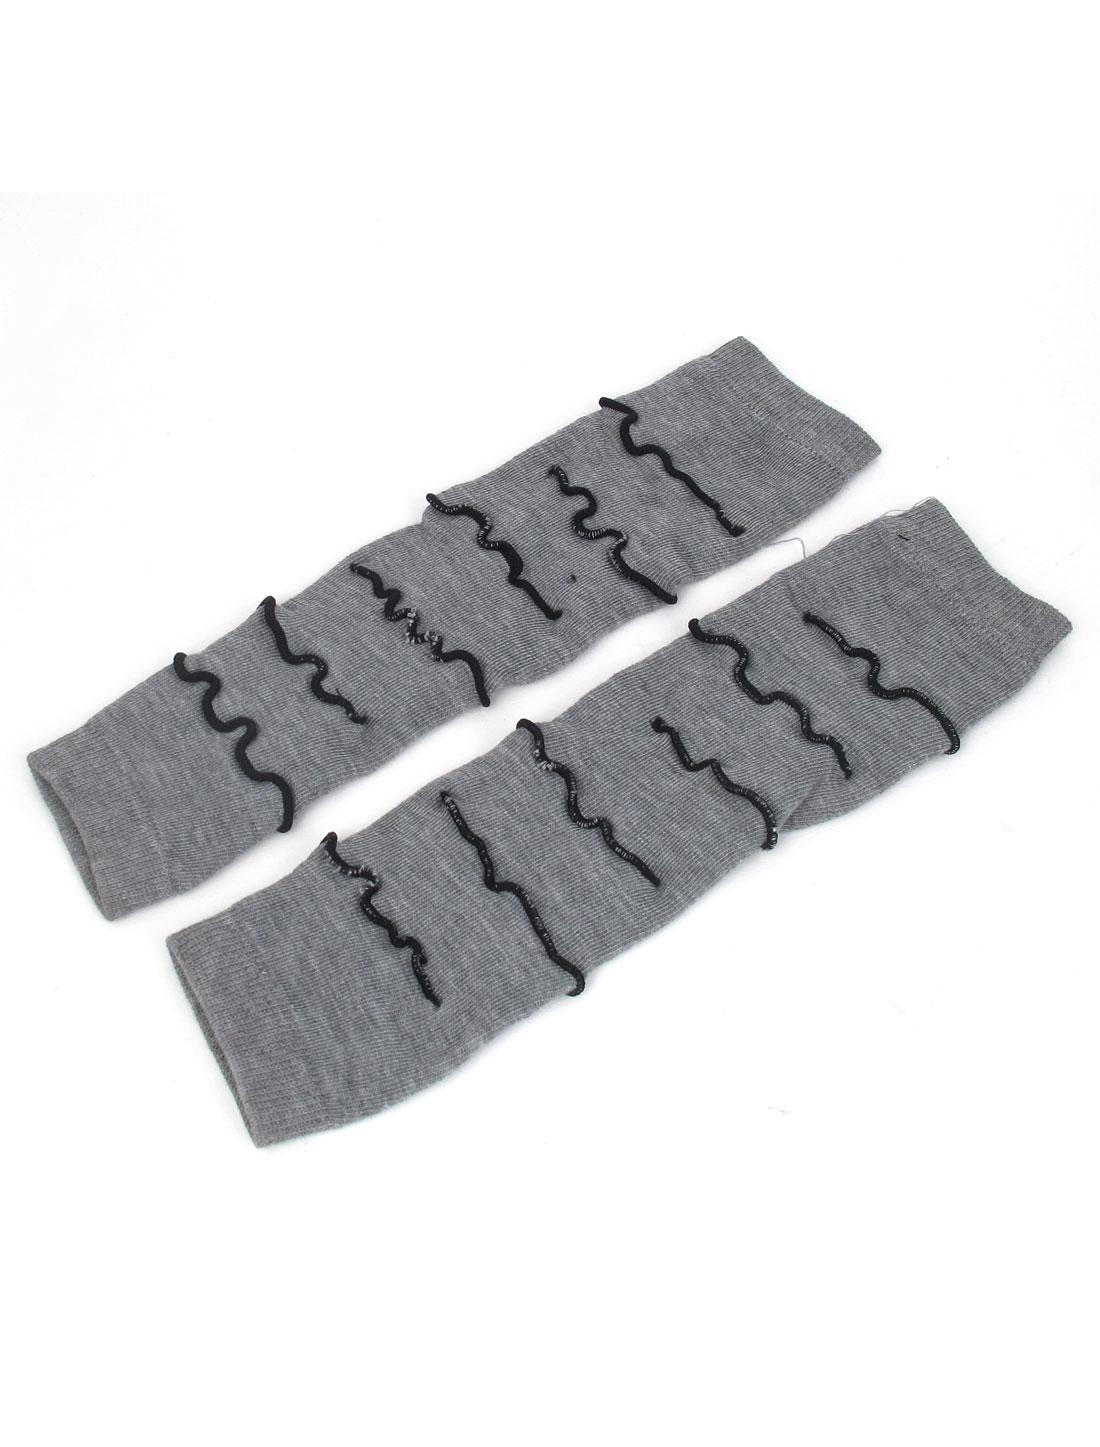 Pair Gray Winter Fall Fingerless Arm Warmers Elbow Long Gloves for Women